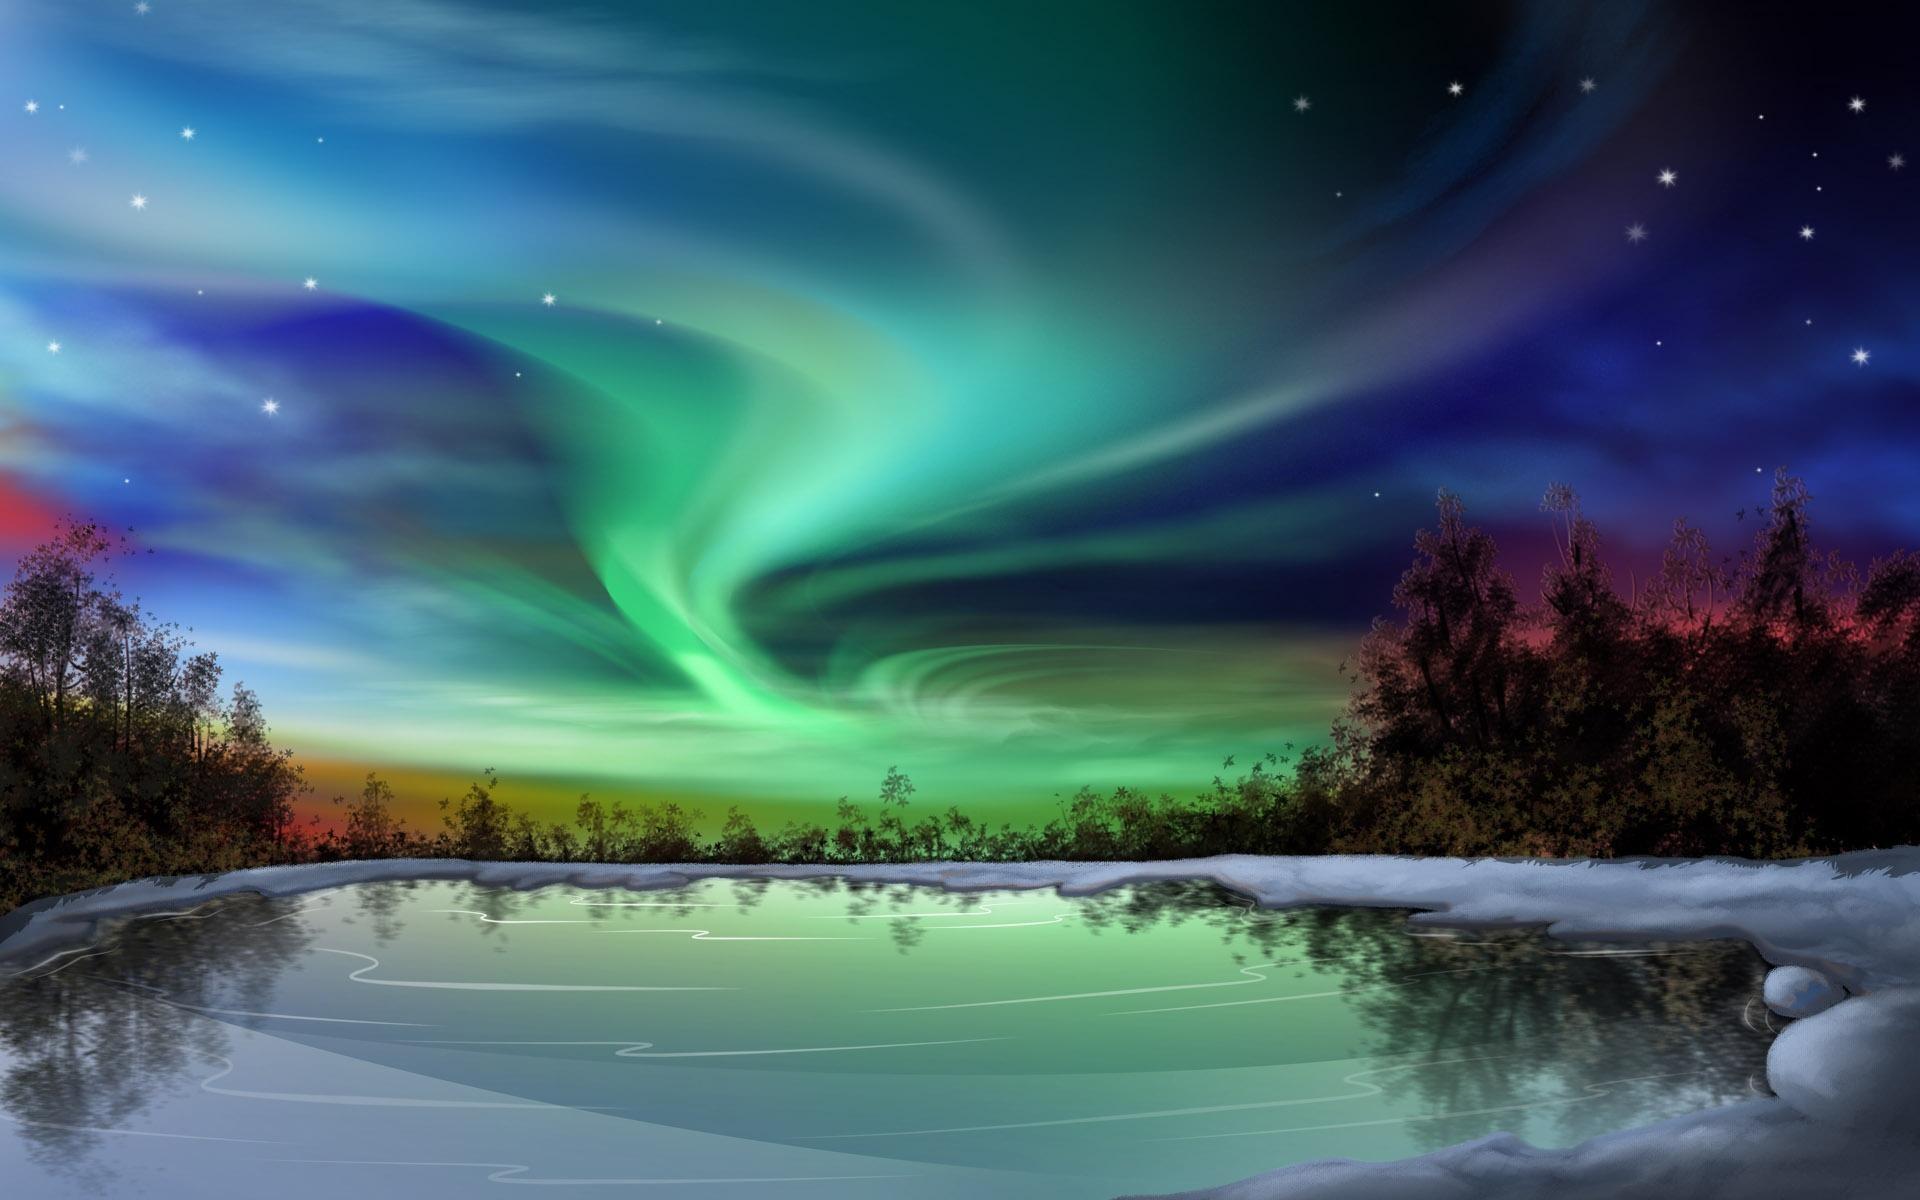 Northern Lights Alaska 30651 High Resolution   download all free jpeg